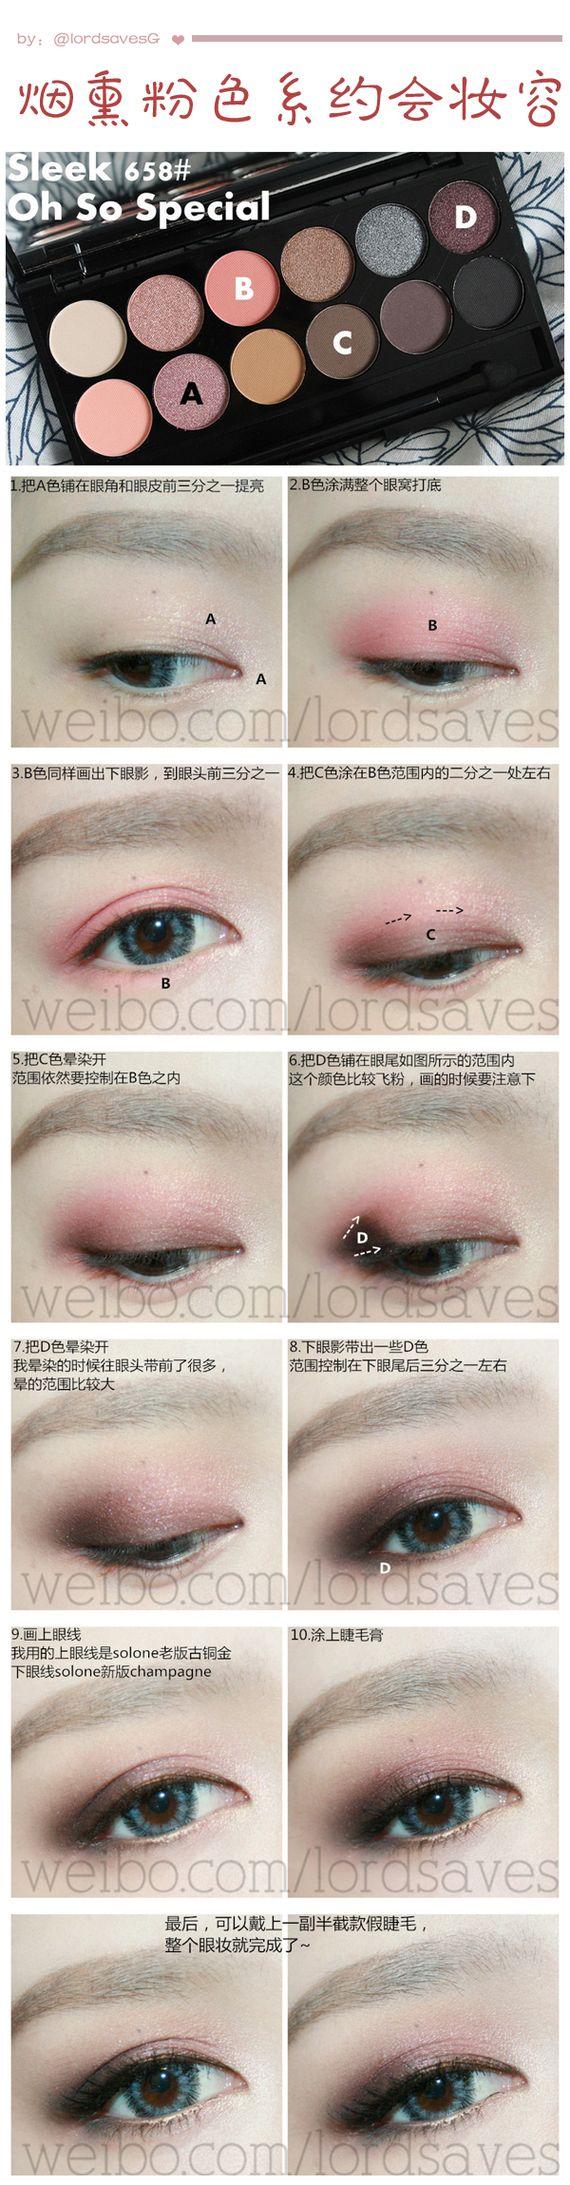 Chinese make up tutorial                                                        ...